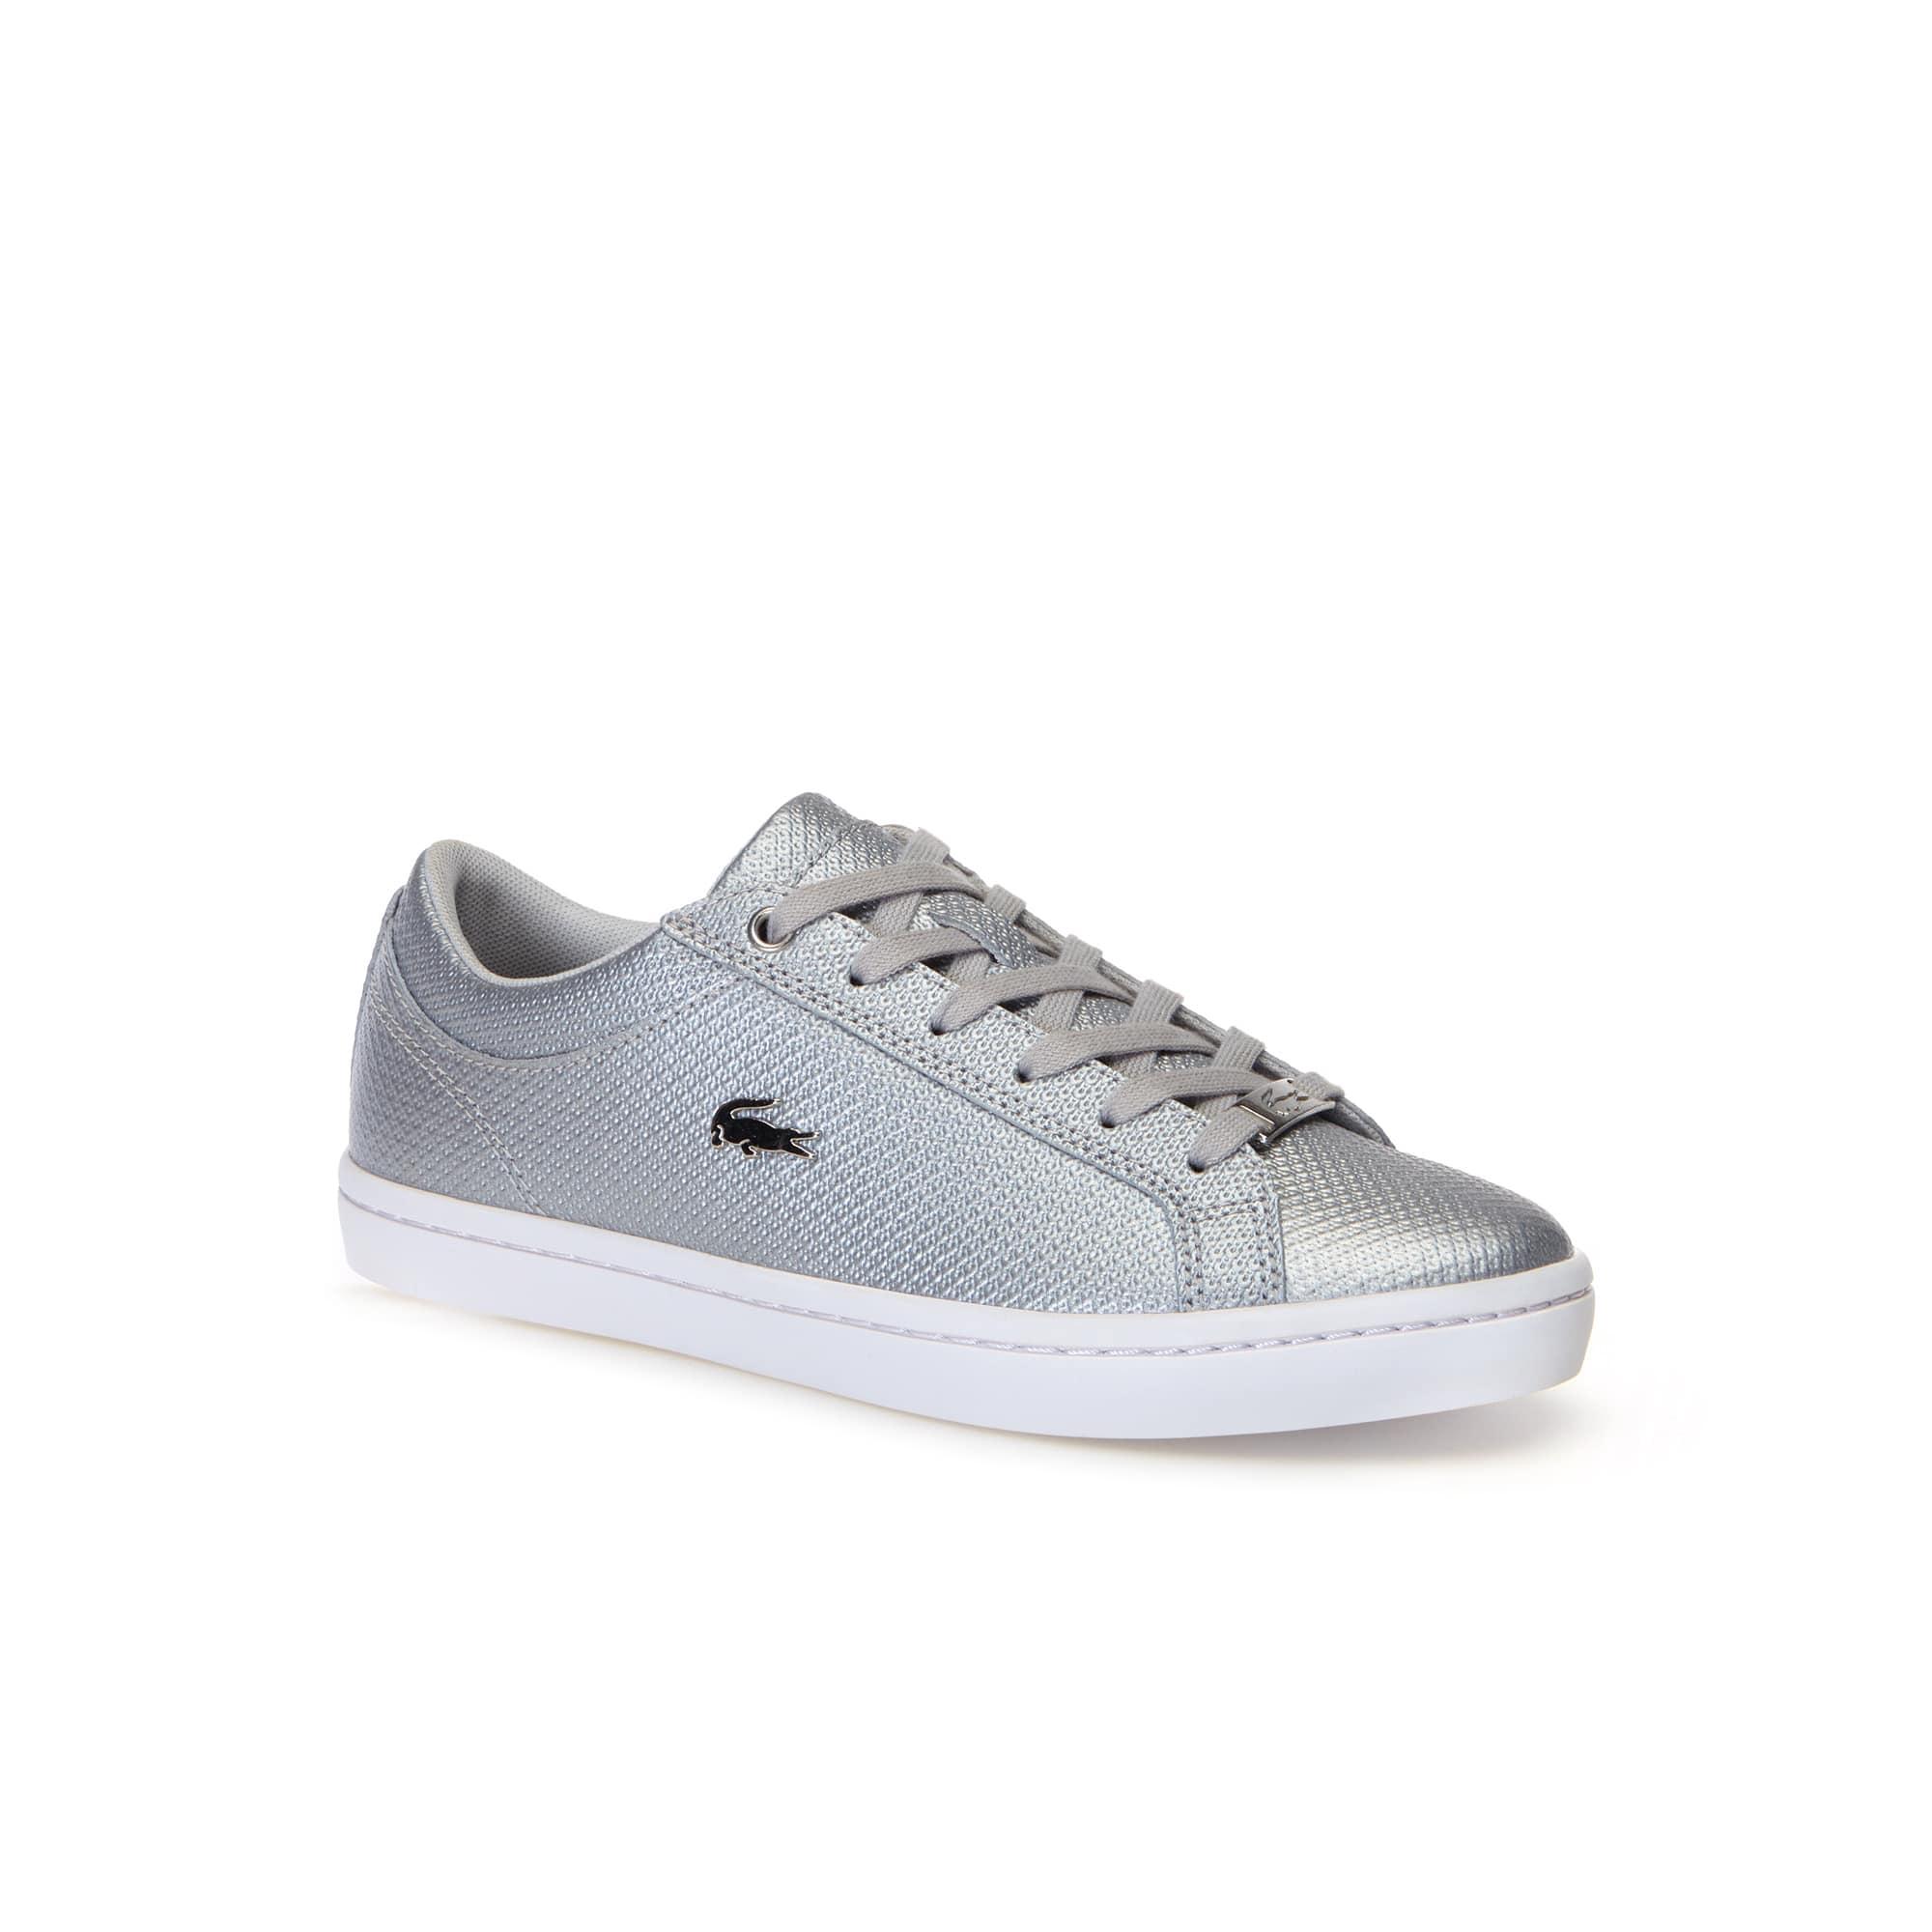 Damen CHANTACO Sneakers STRAIGHTSET aus Leder